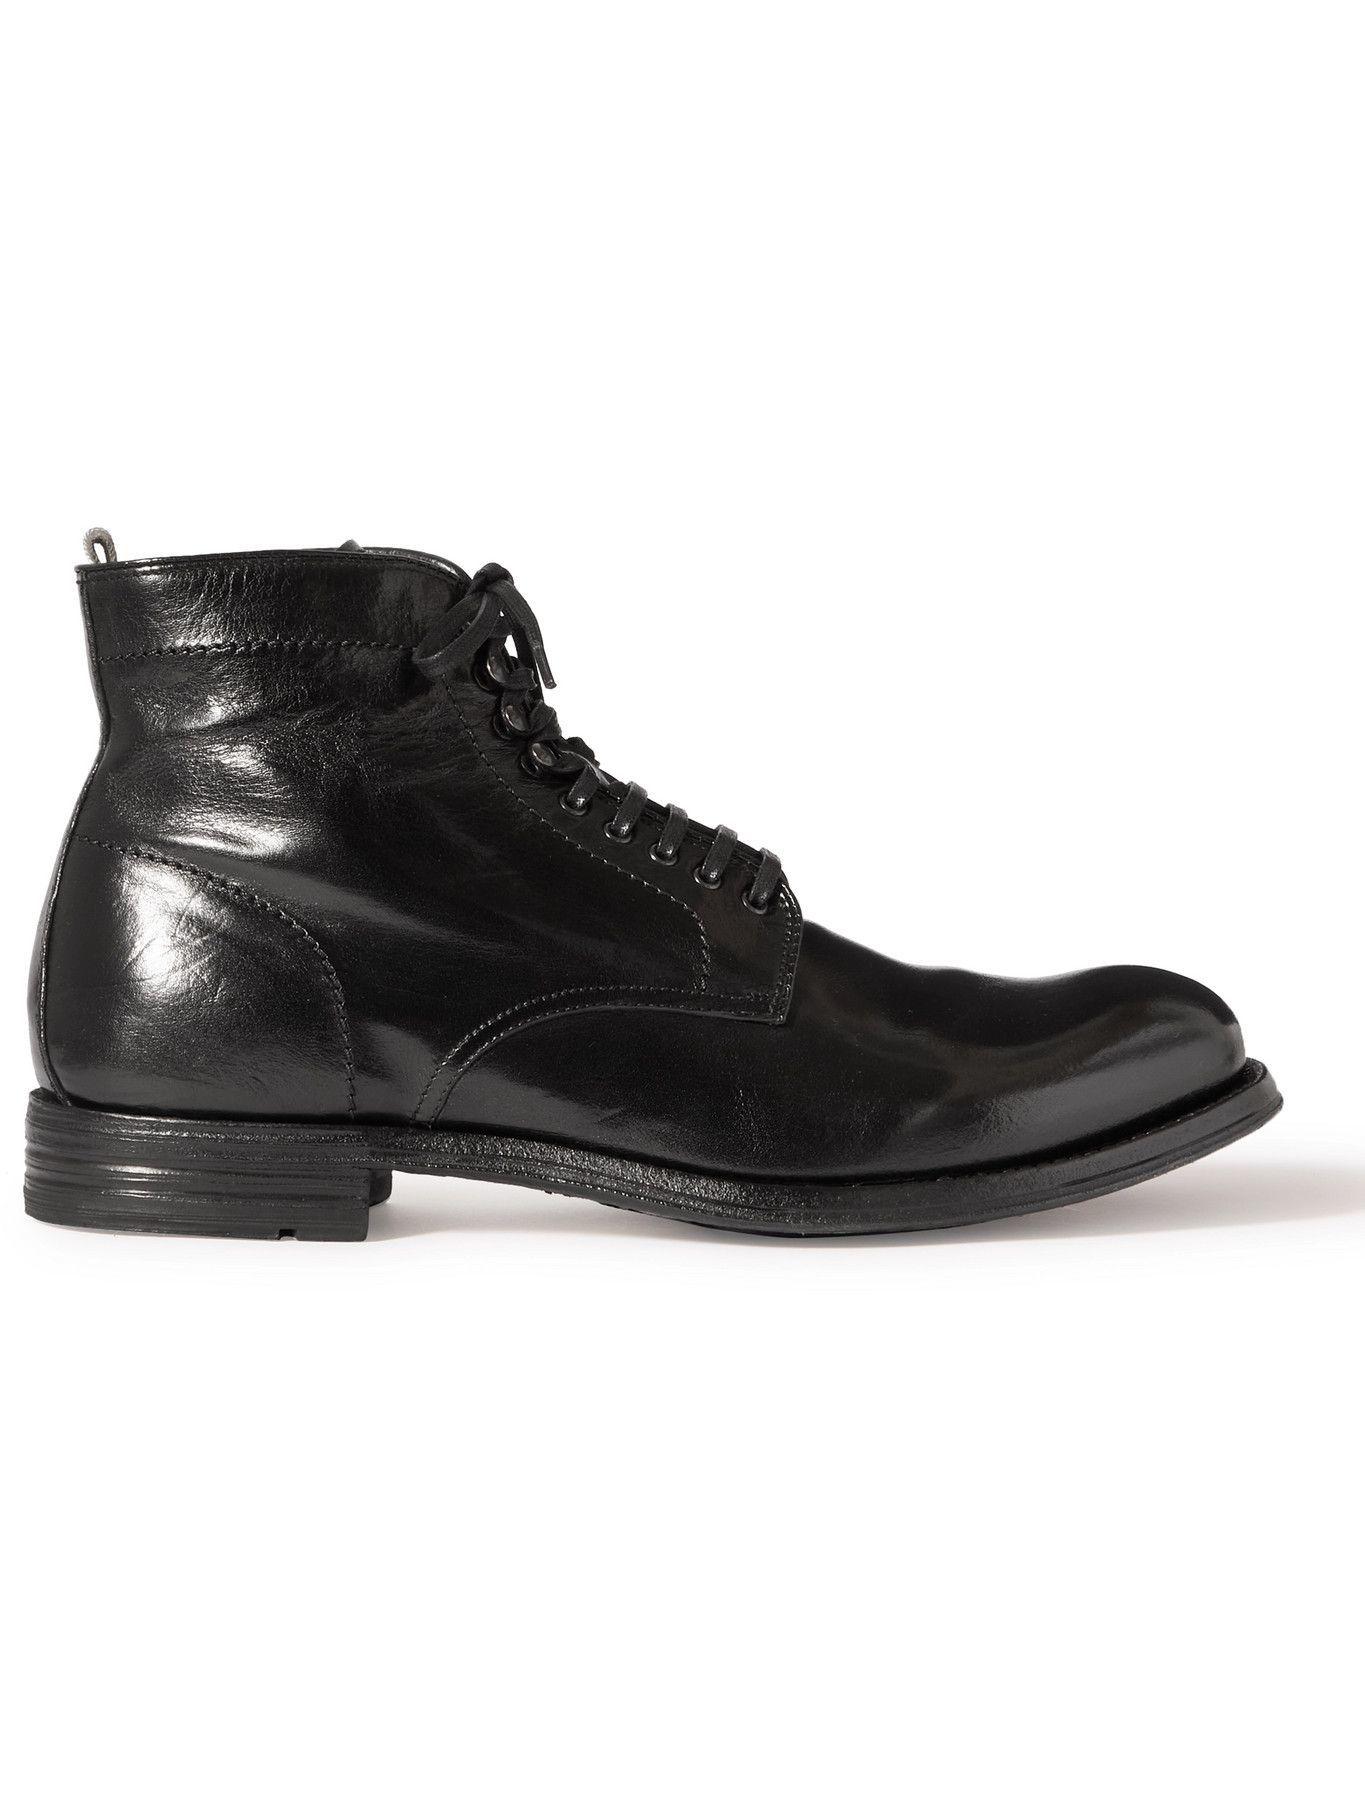 Photo: OFFICINE CREATIVE - Balance Polished-Leather Boots - Black